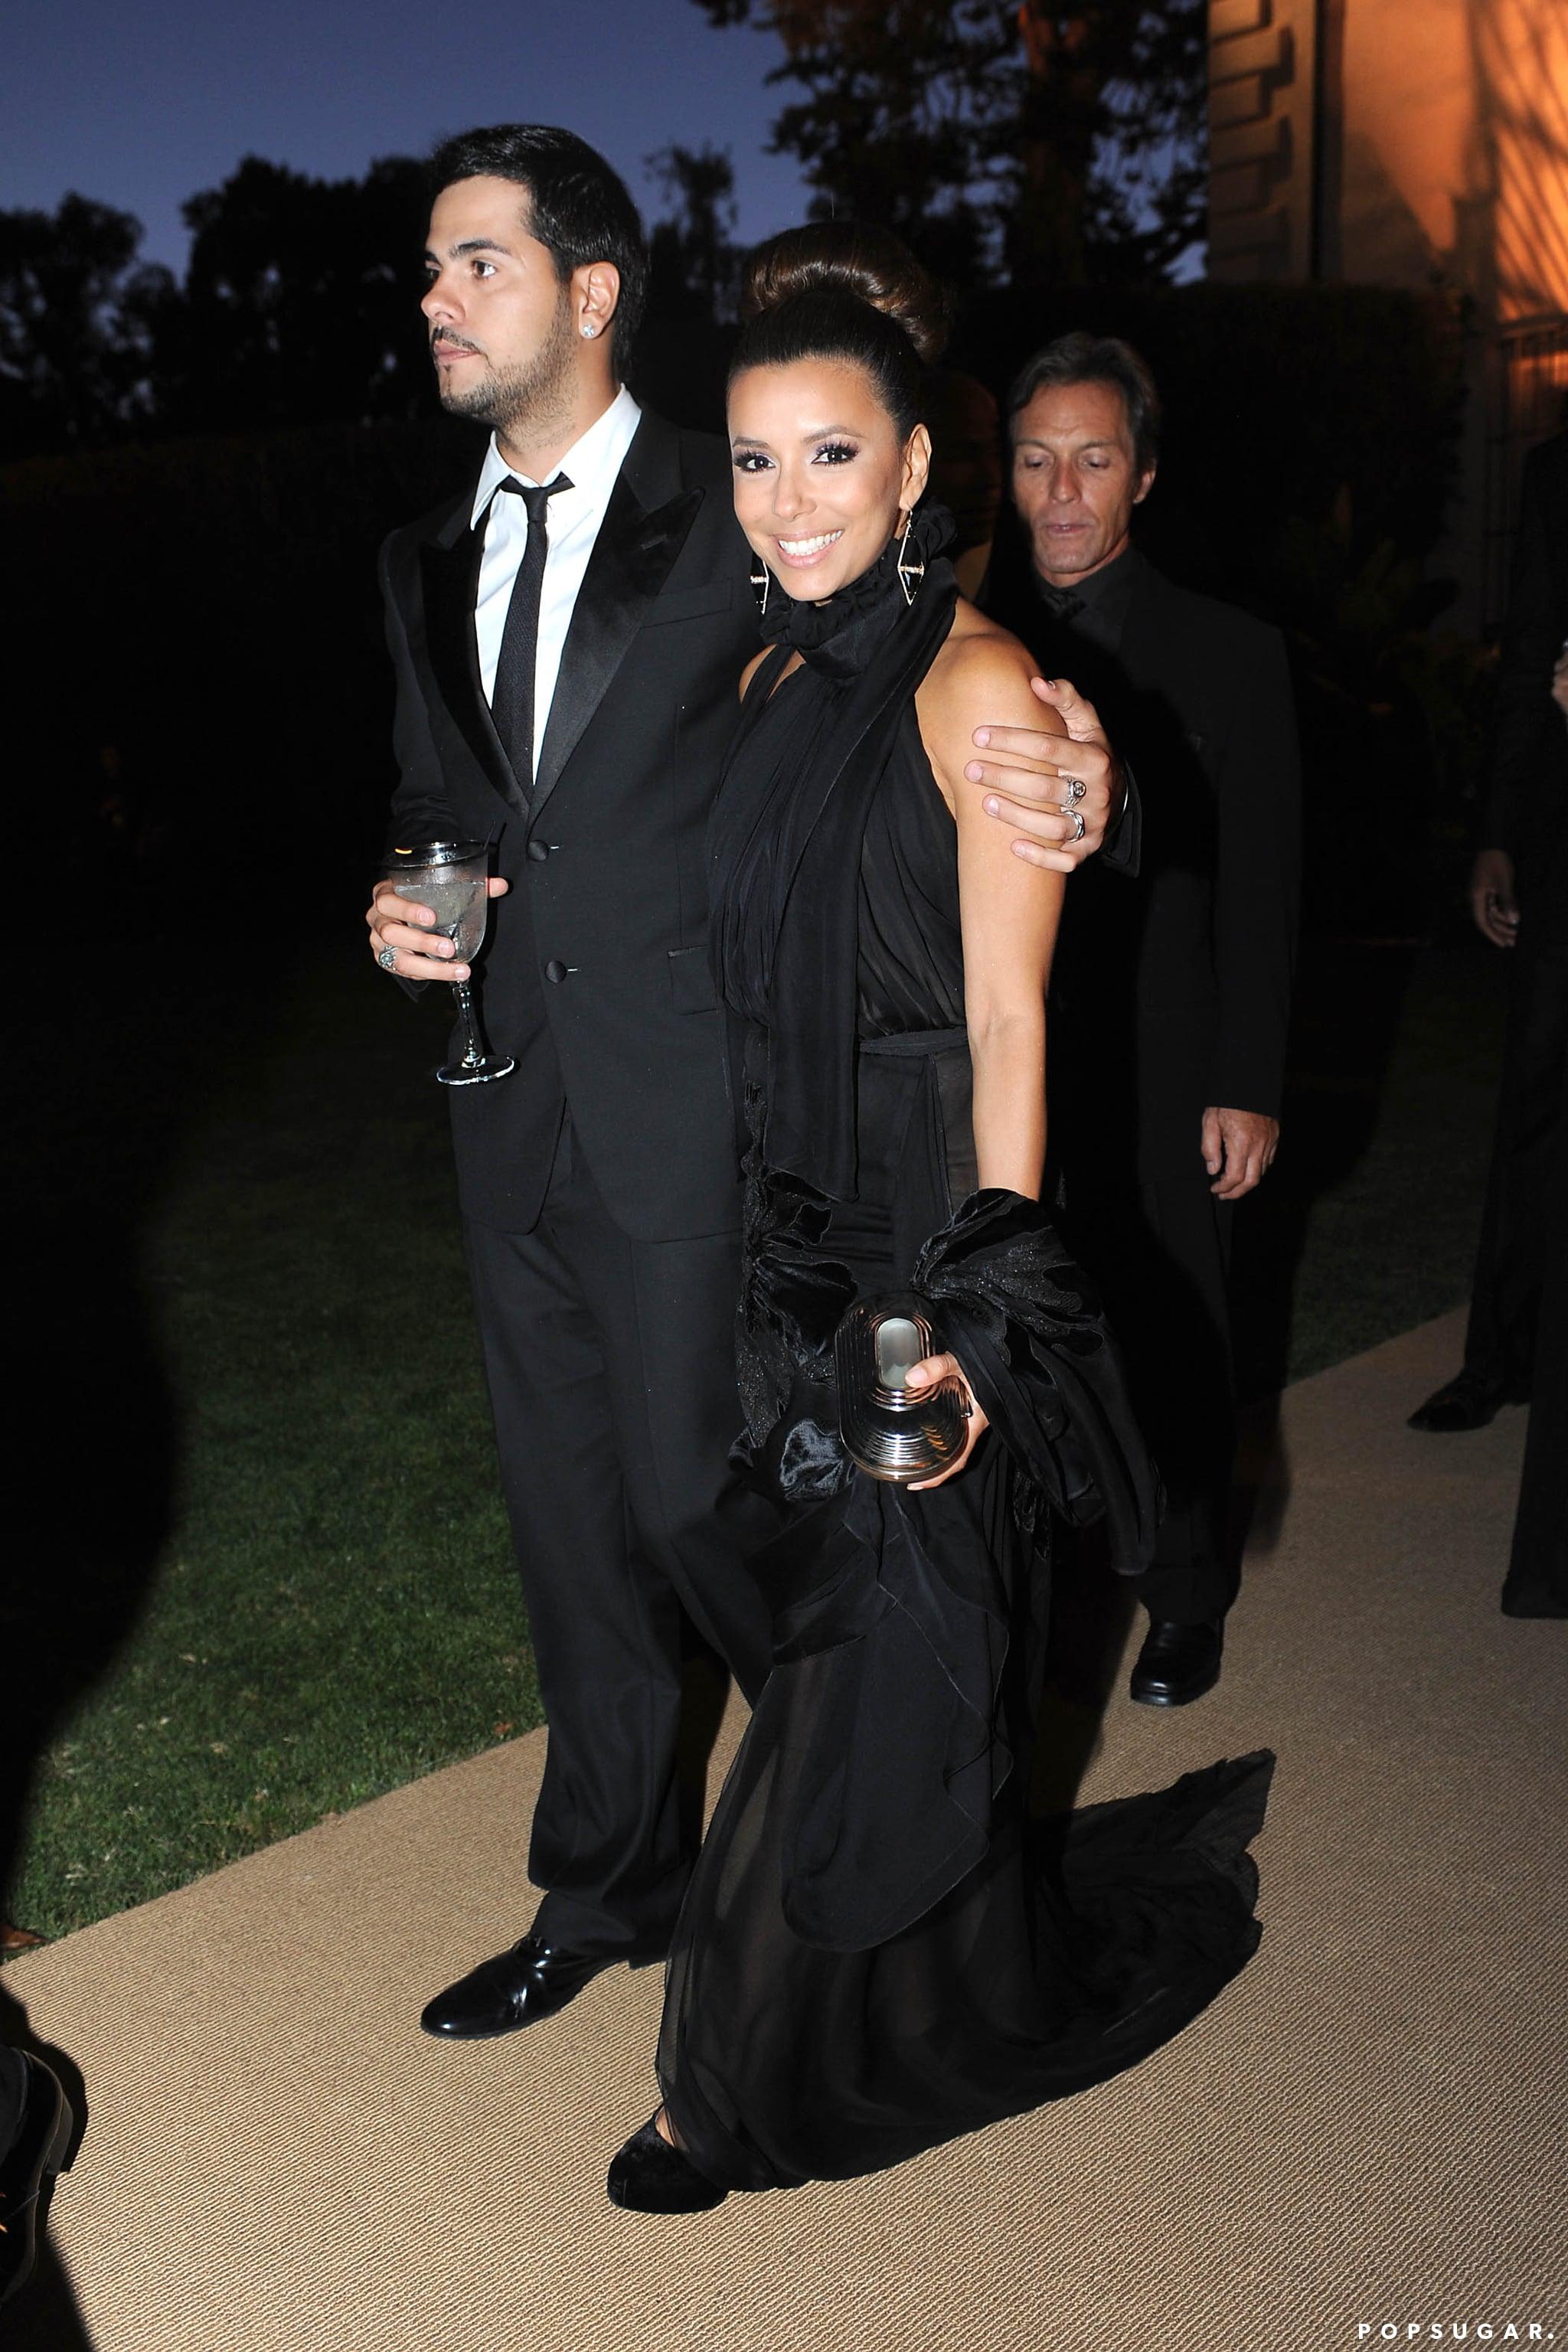 Eva Longoria brought her then-boyfriend, Eduardo Cruz, along for the festivities.